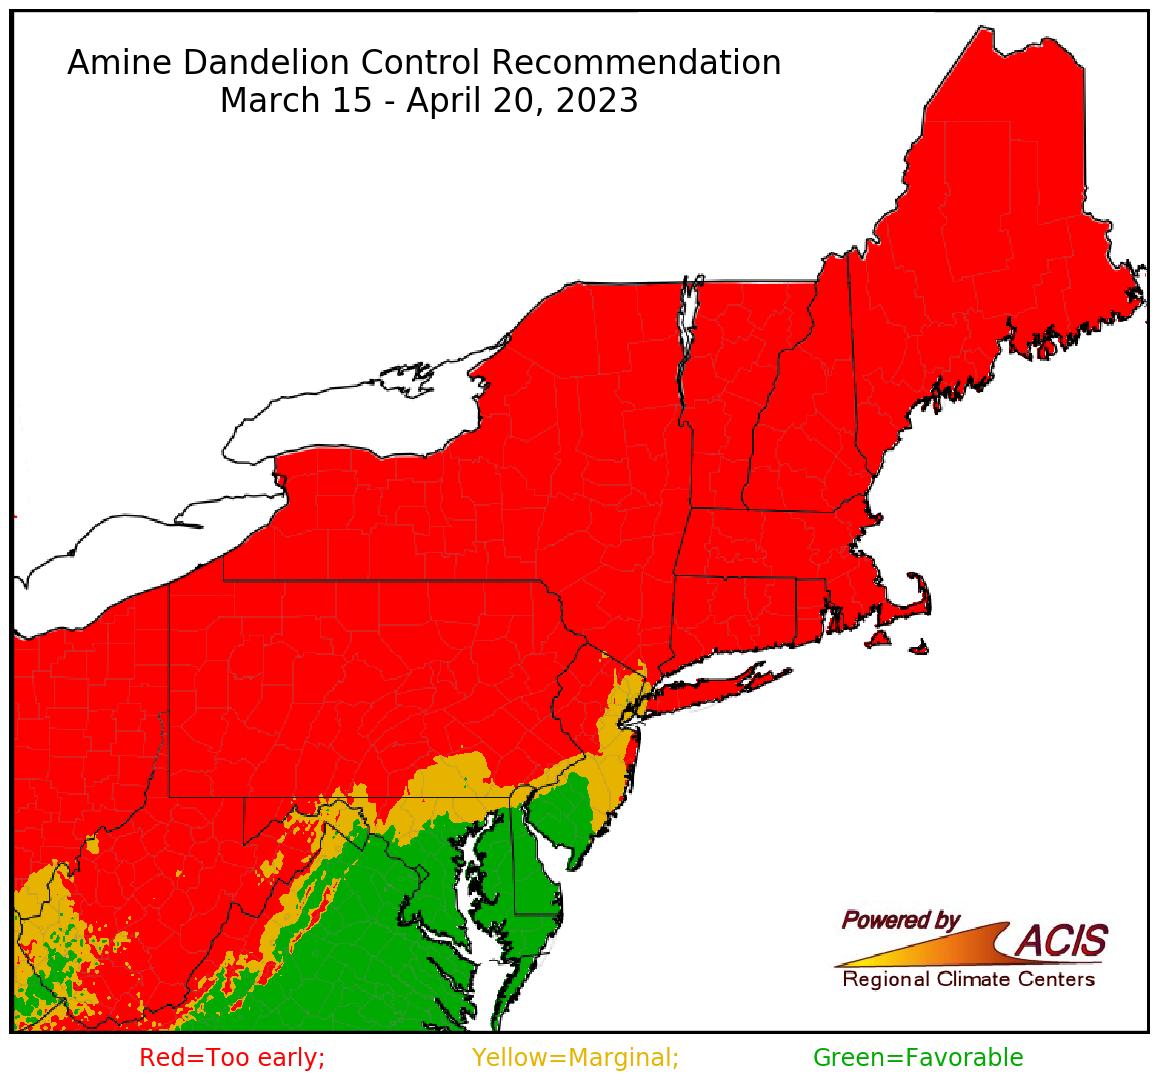 amine dandelion control recommendation